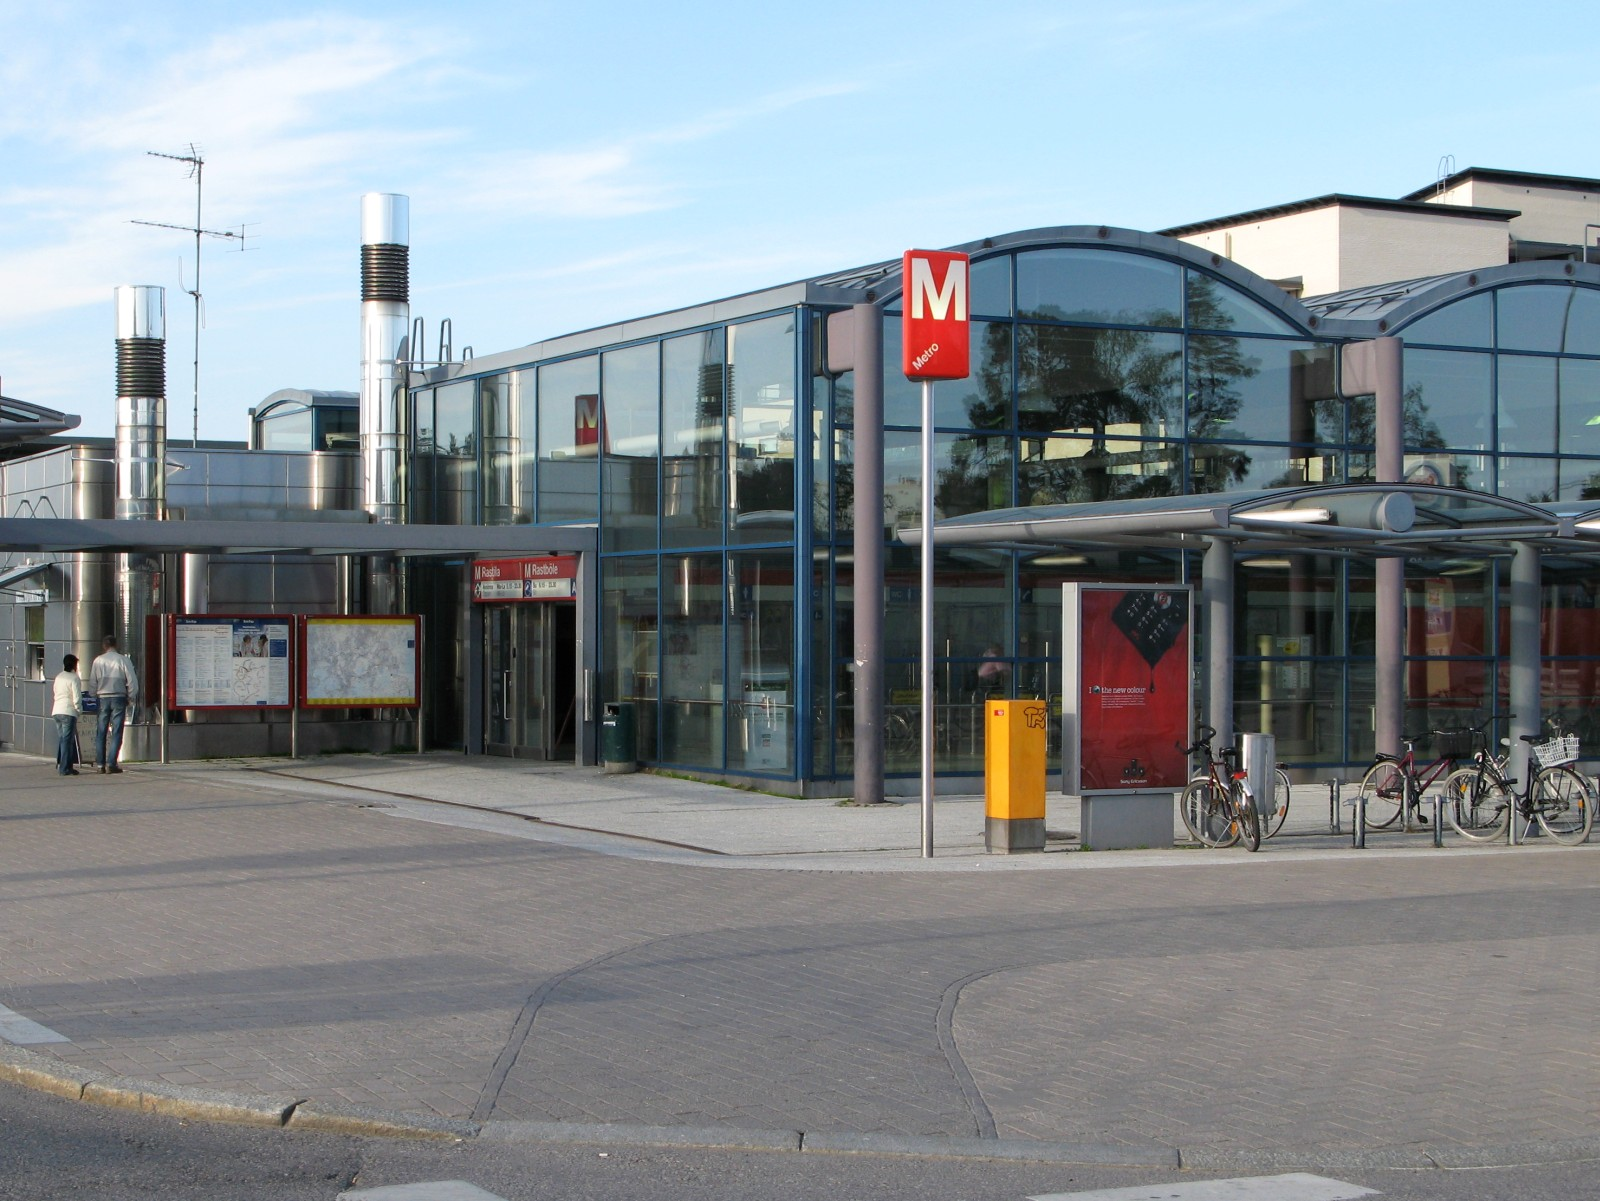 Tapiola Metroasema